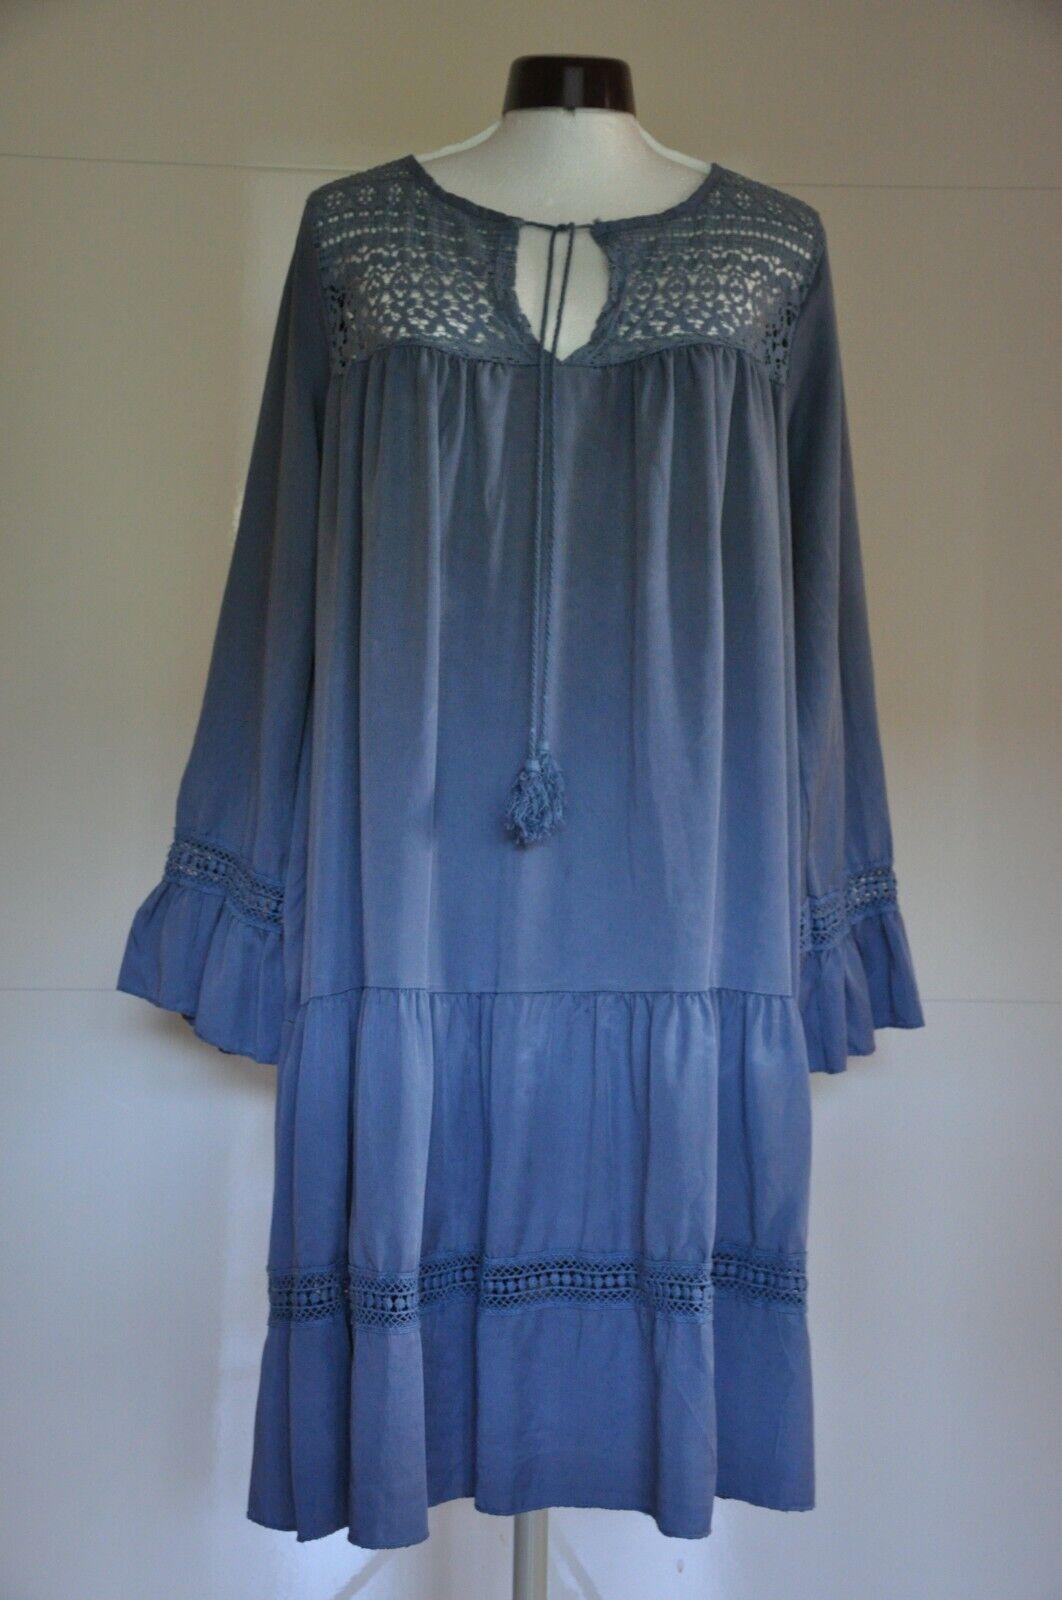 Ibiza Mode blaues Boho Hippie Kleid, Gr. M / 38, neu